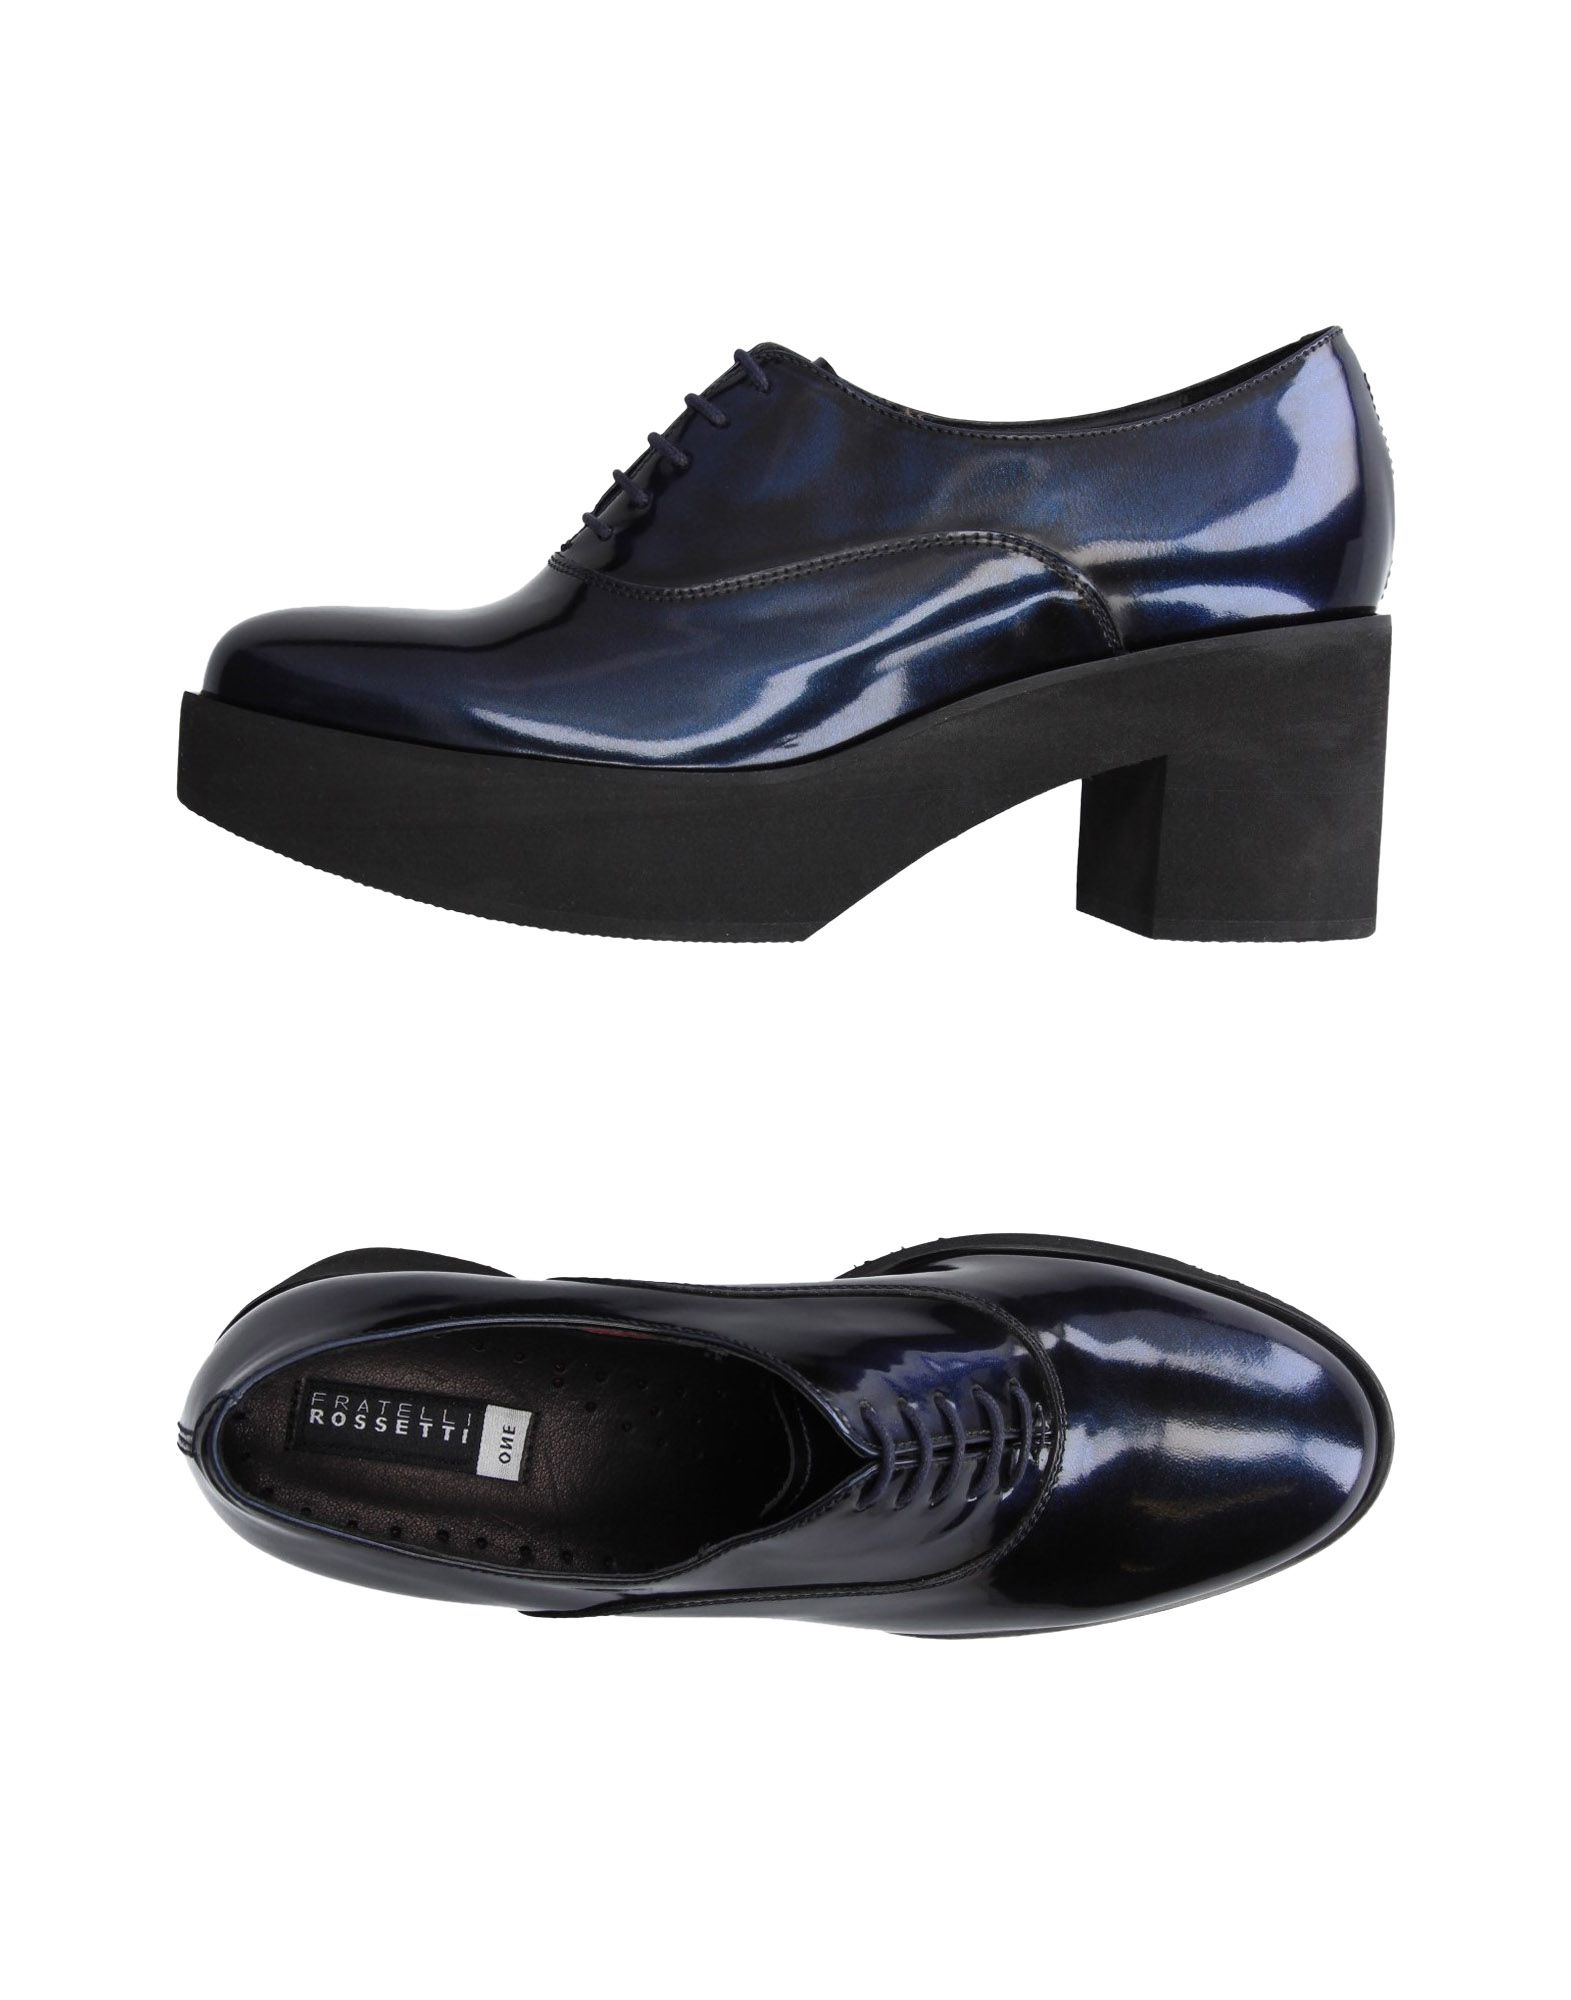 Fratelli Rossetti Schnürschuhe Damen  11219351FOGut aussehende strapazierfähige Schuhe